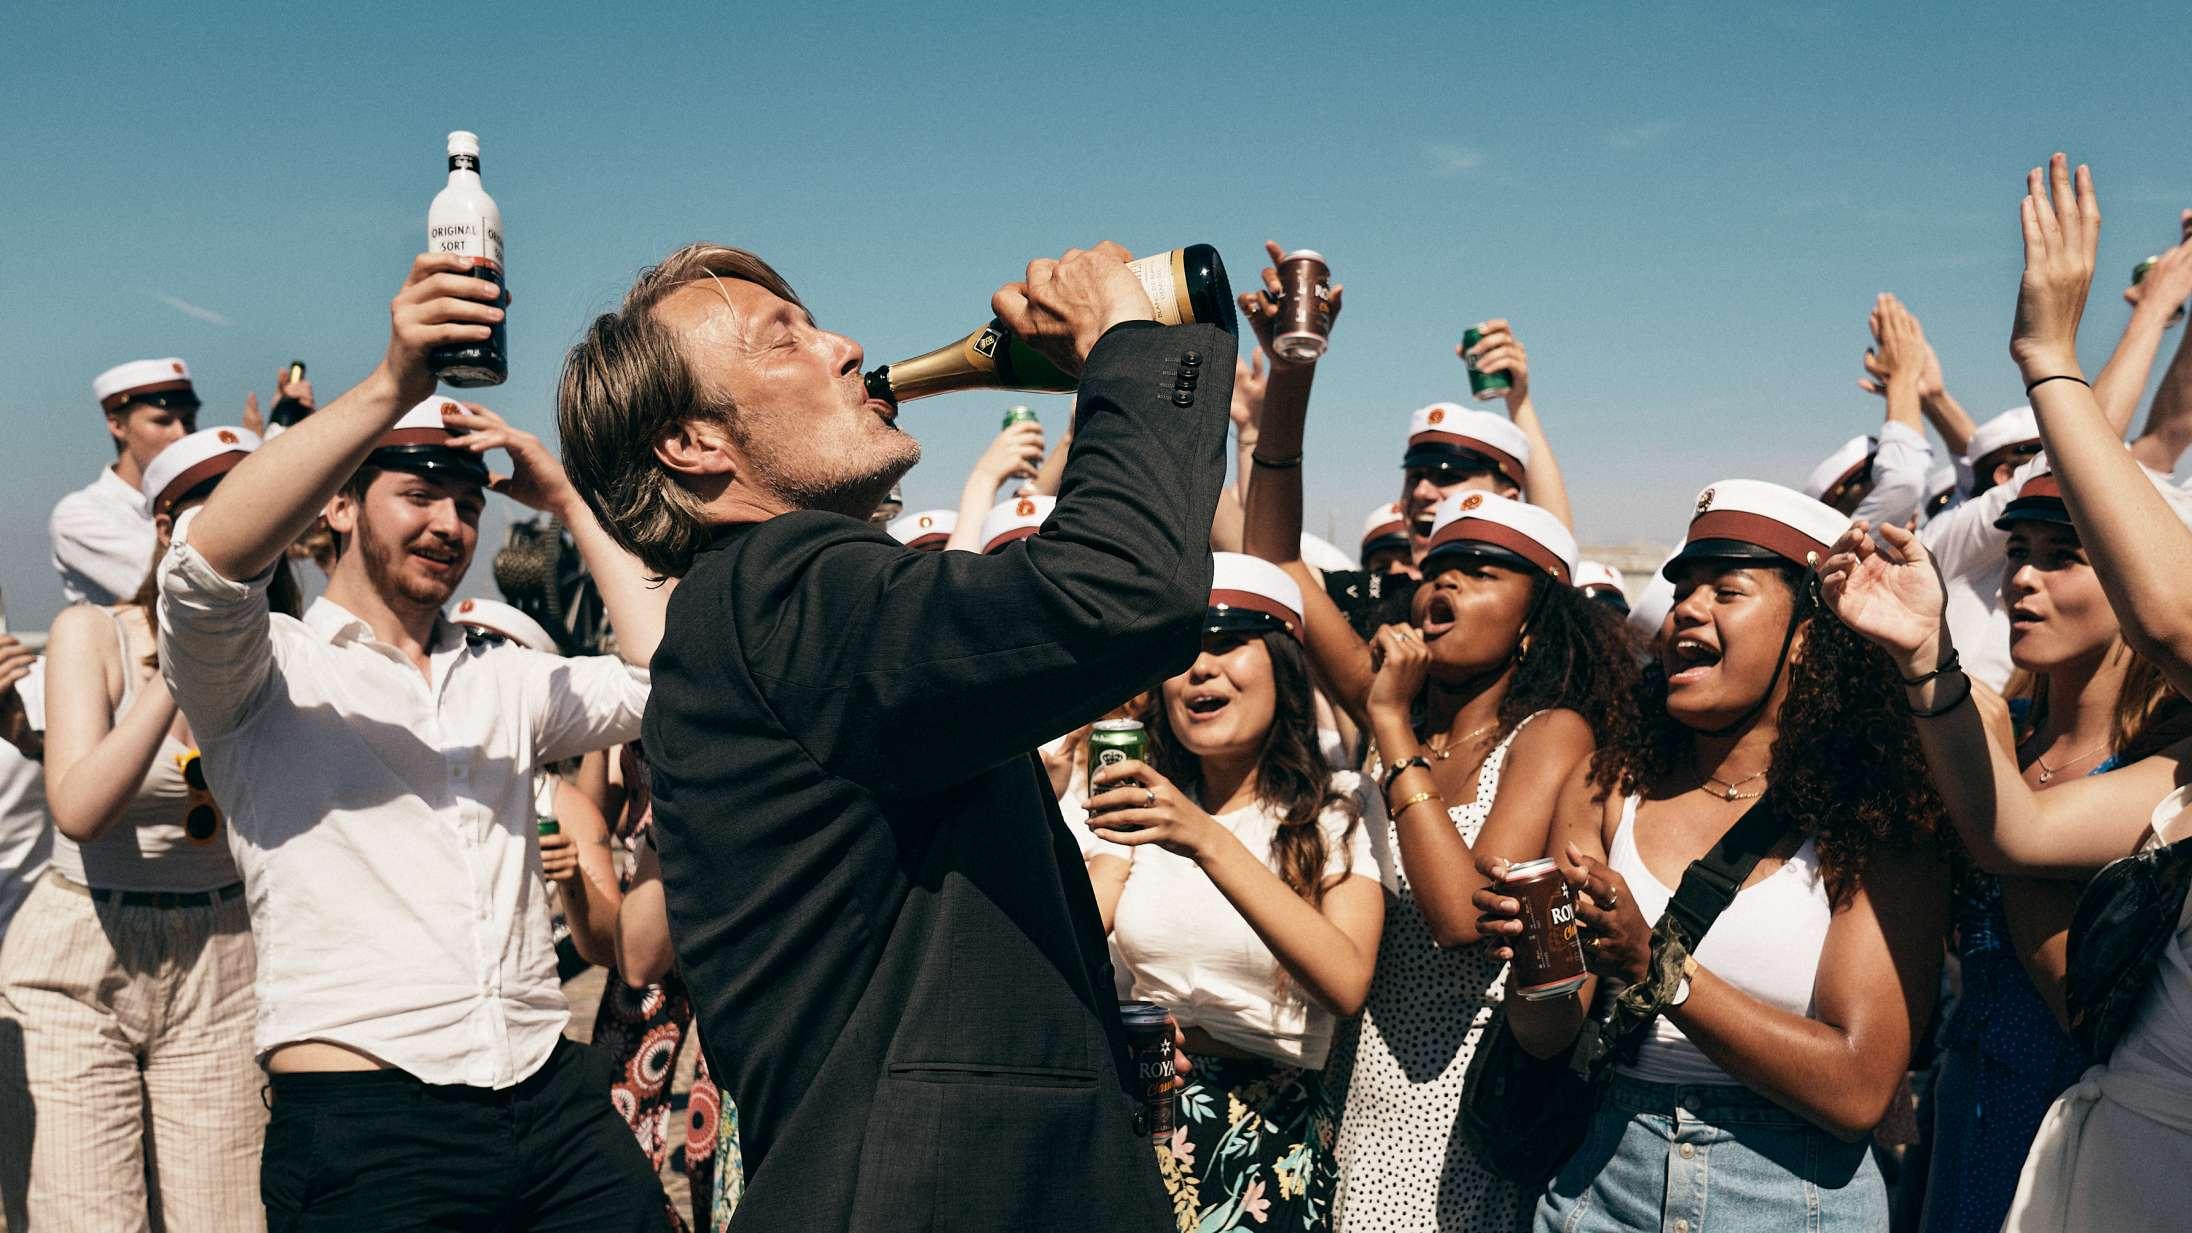 'Druk': Thomas Vinterbergs alkofilm boltrer sig eminent mellem eufori og afgrund